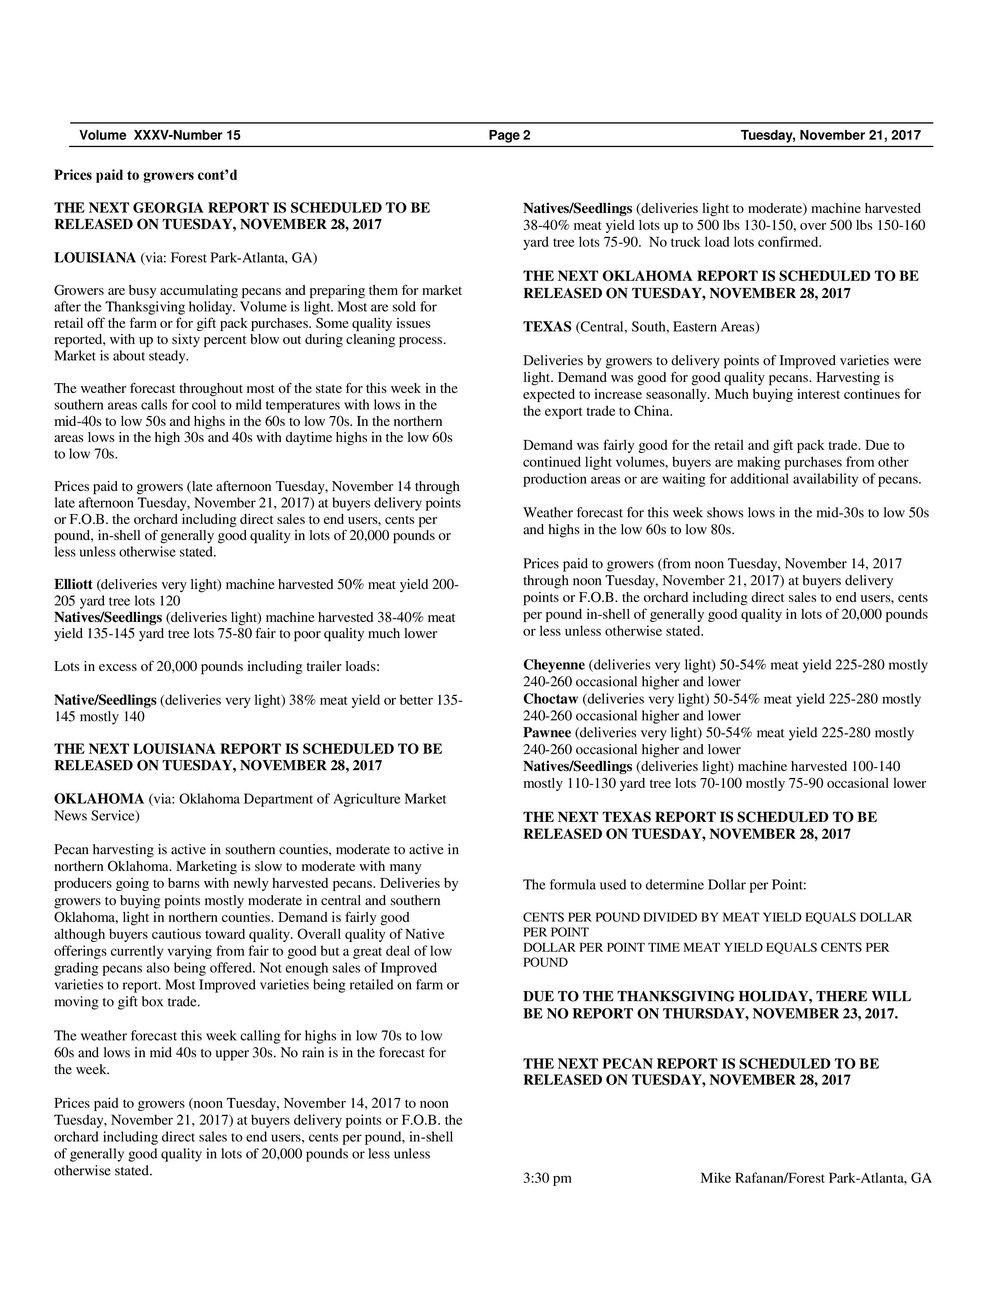 USDA Pecan Report 11-21-17-page-002.jpg